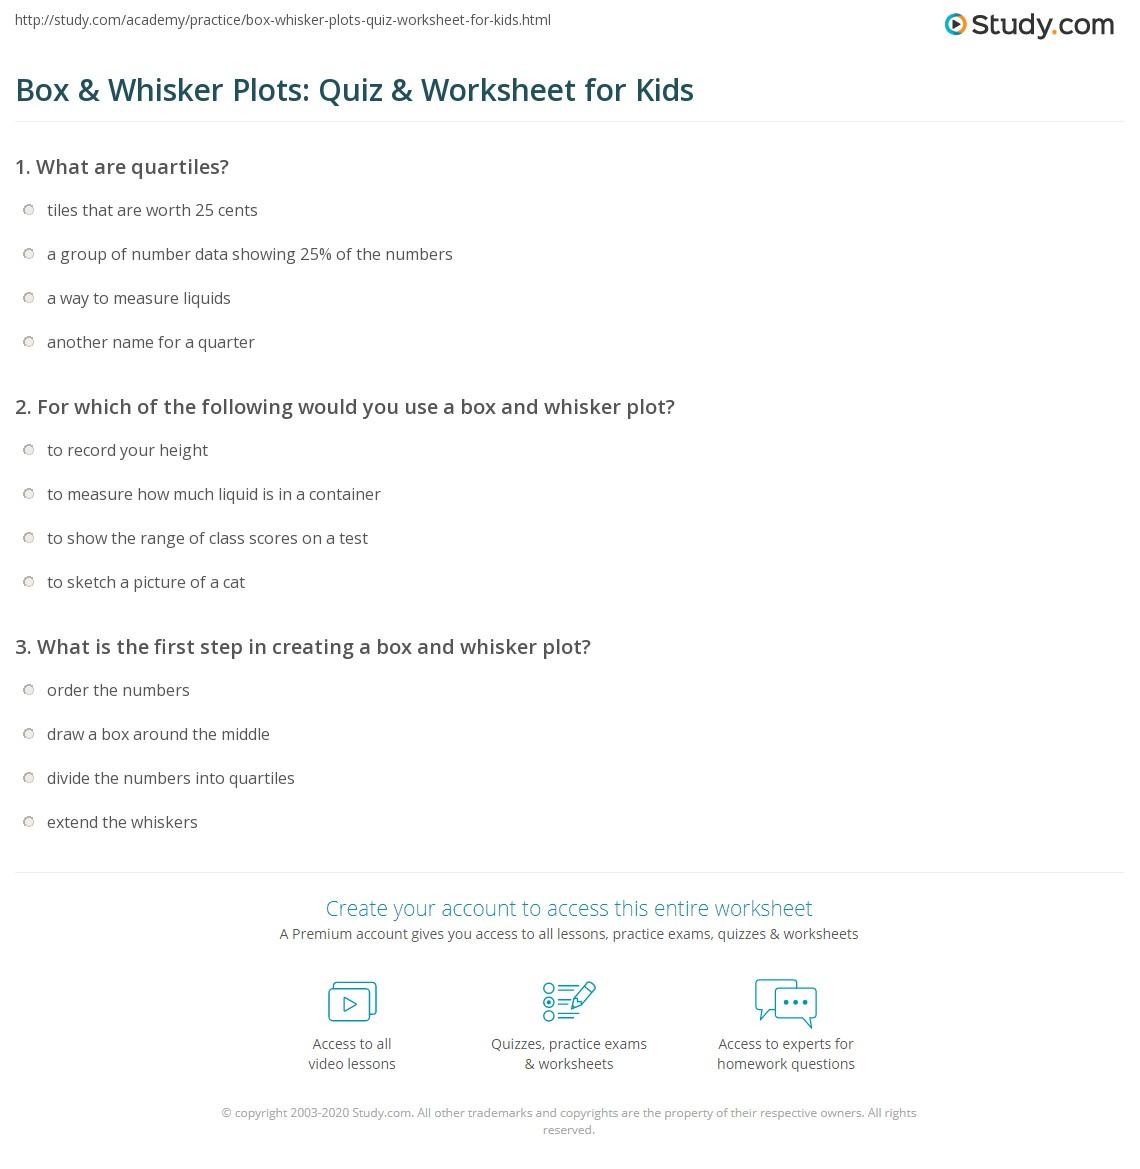 Box Whisker Plots Quiz W Ksheet Kids Study